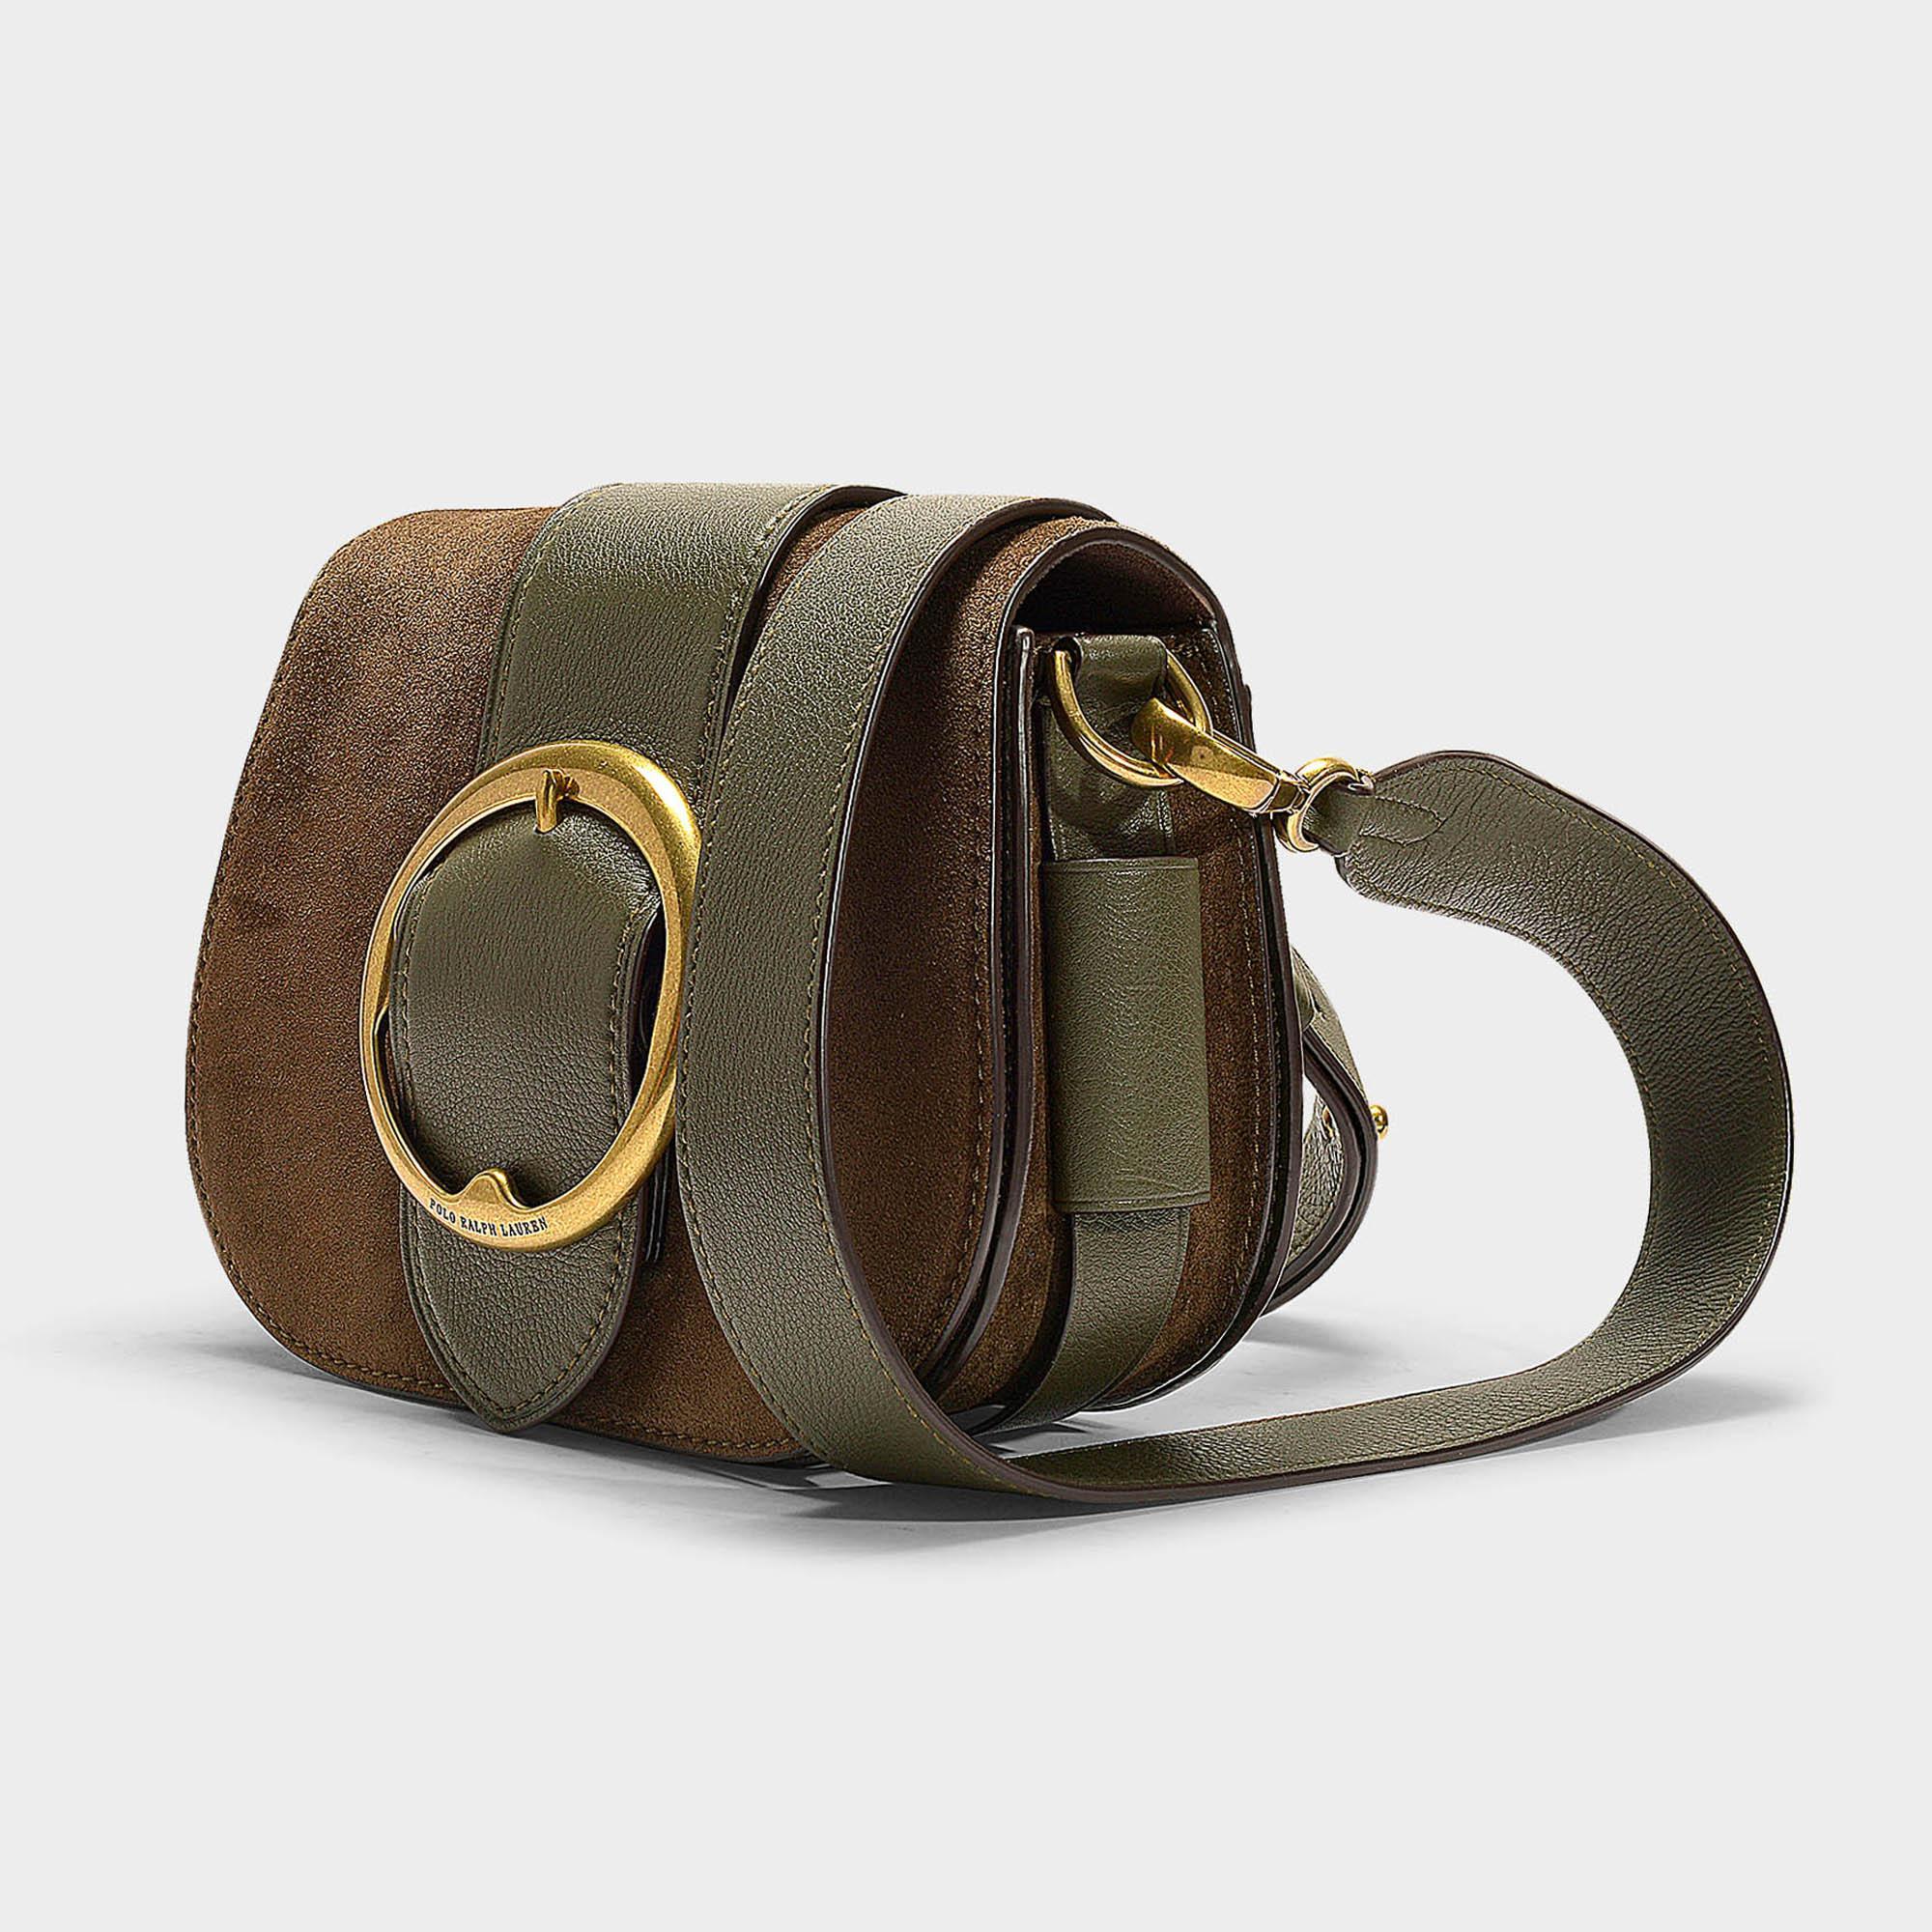 002a4d618e Lyst - Polo Ralph Lauren Belt Saddle Lennox Medium Crossbody Bag In ...